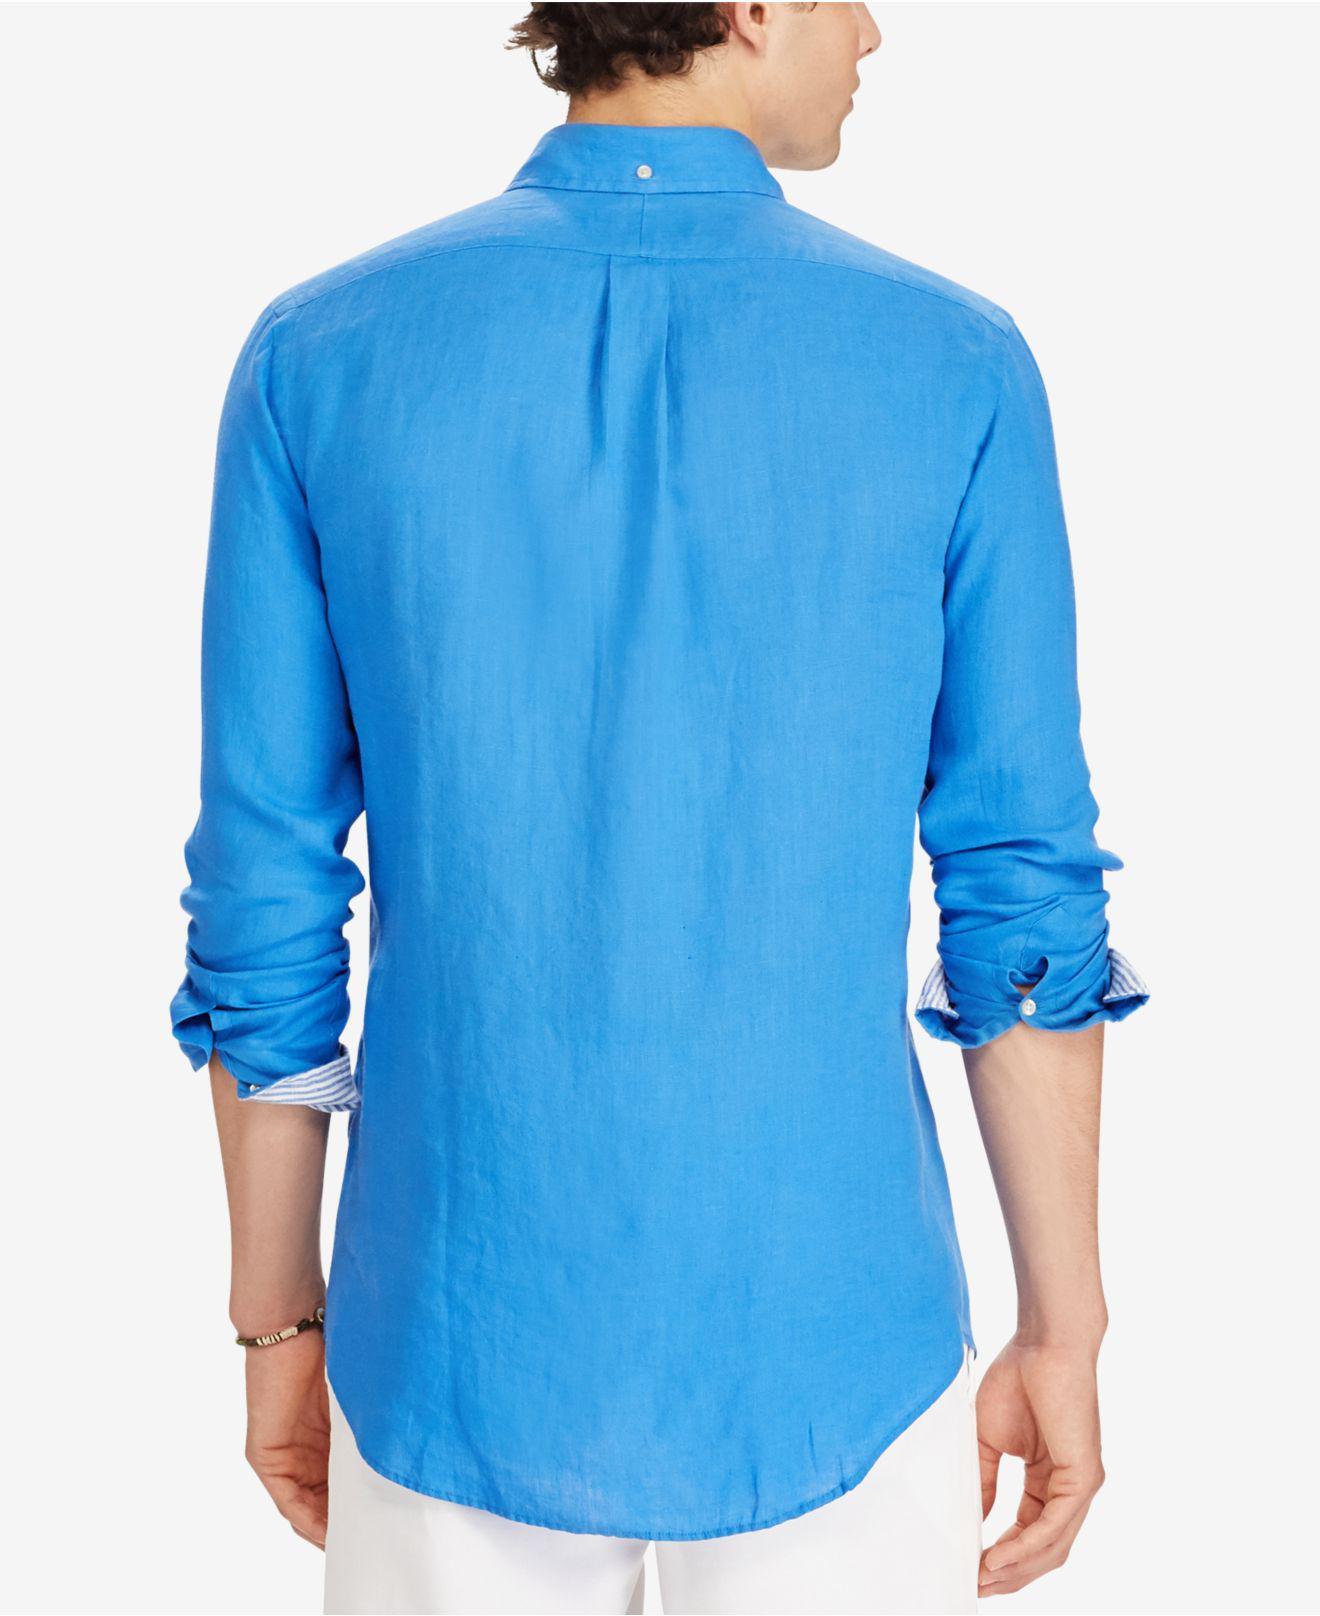 dca584b7 Royal Blue Linen Shirts - DREAMWORKS